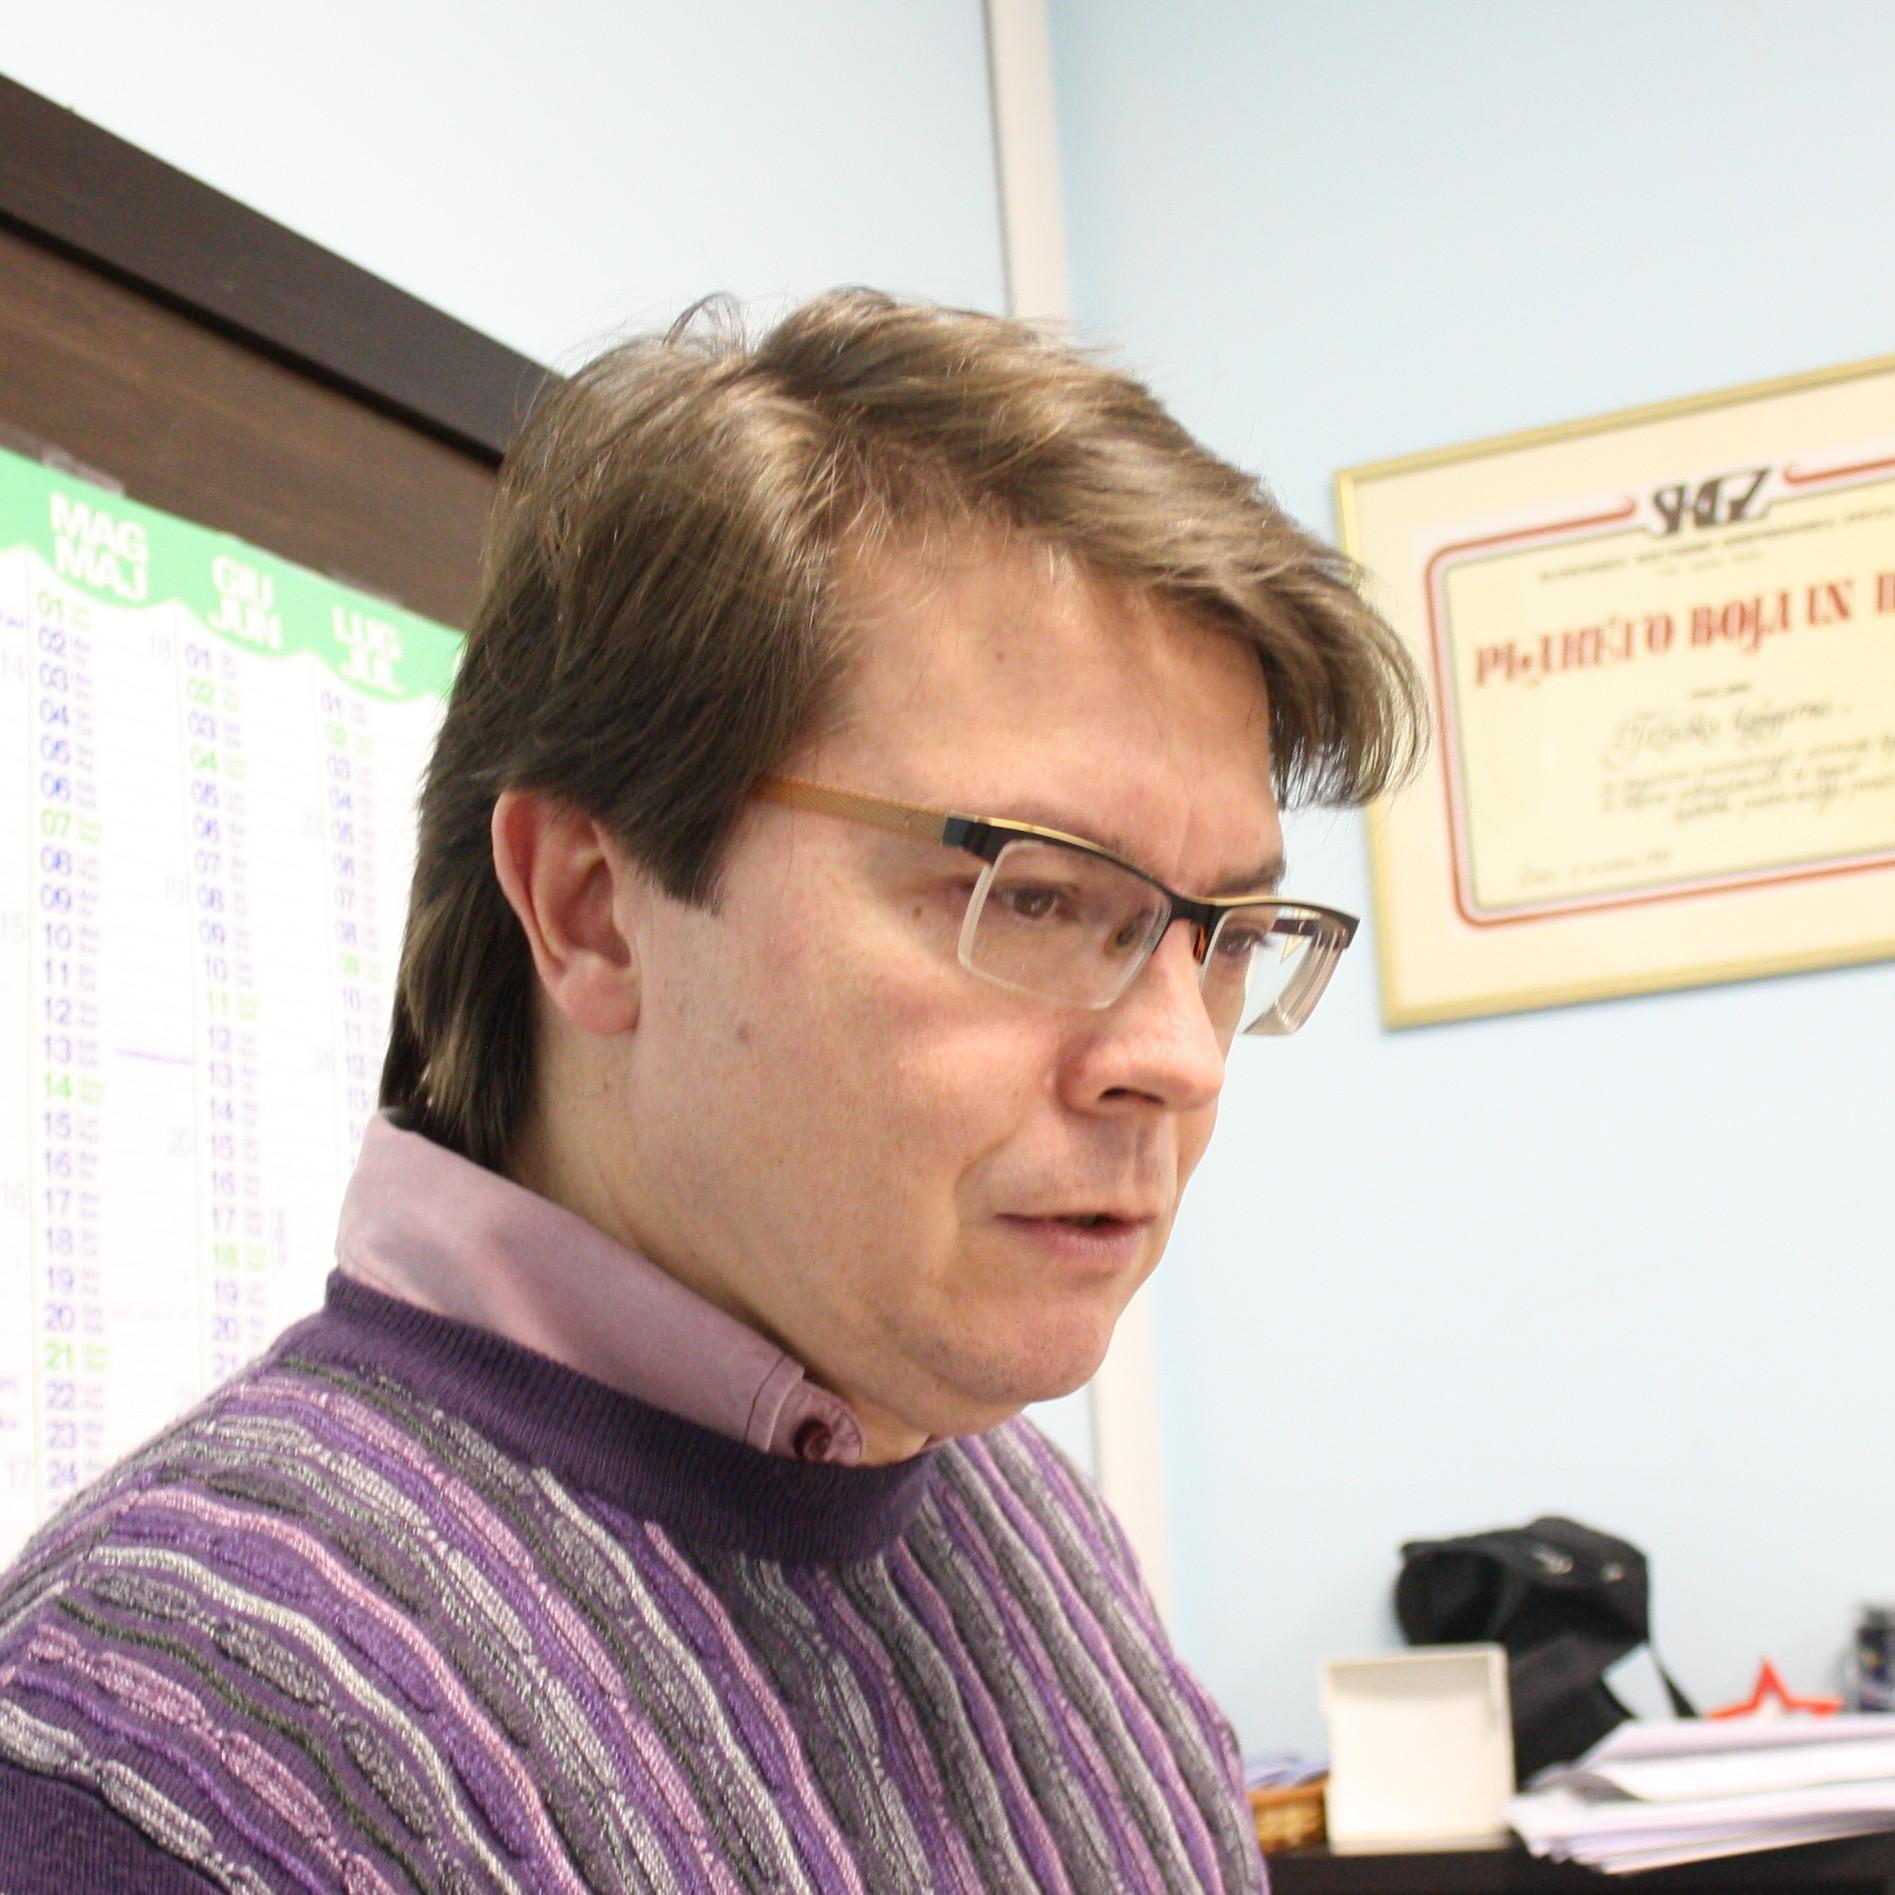 Marko Rupel